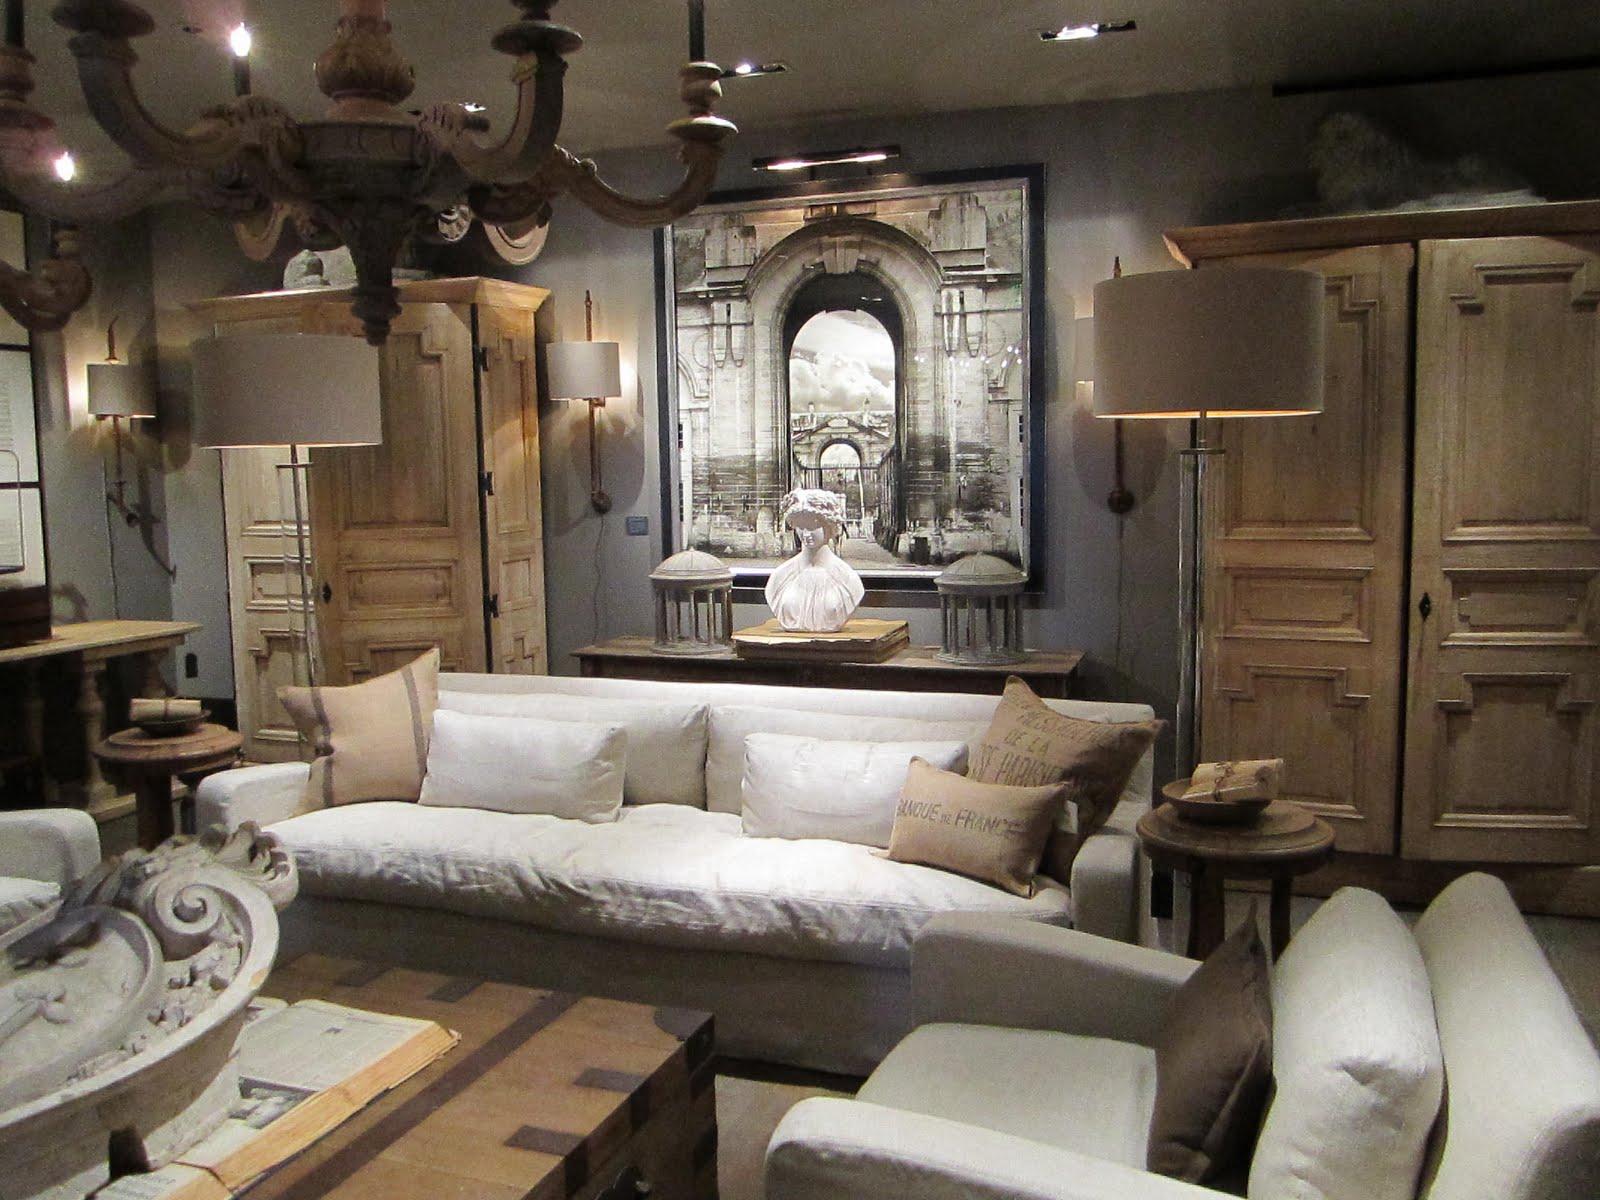 Restoration hardware living room photos